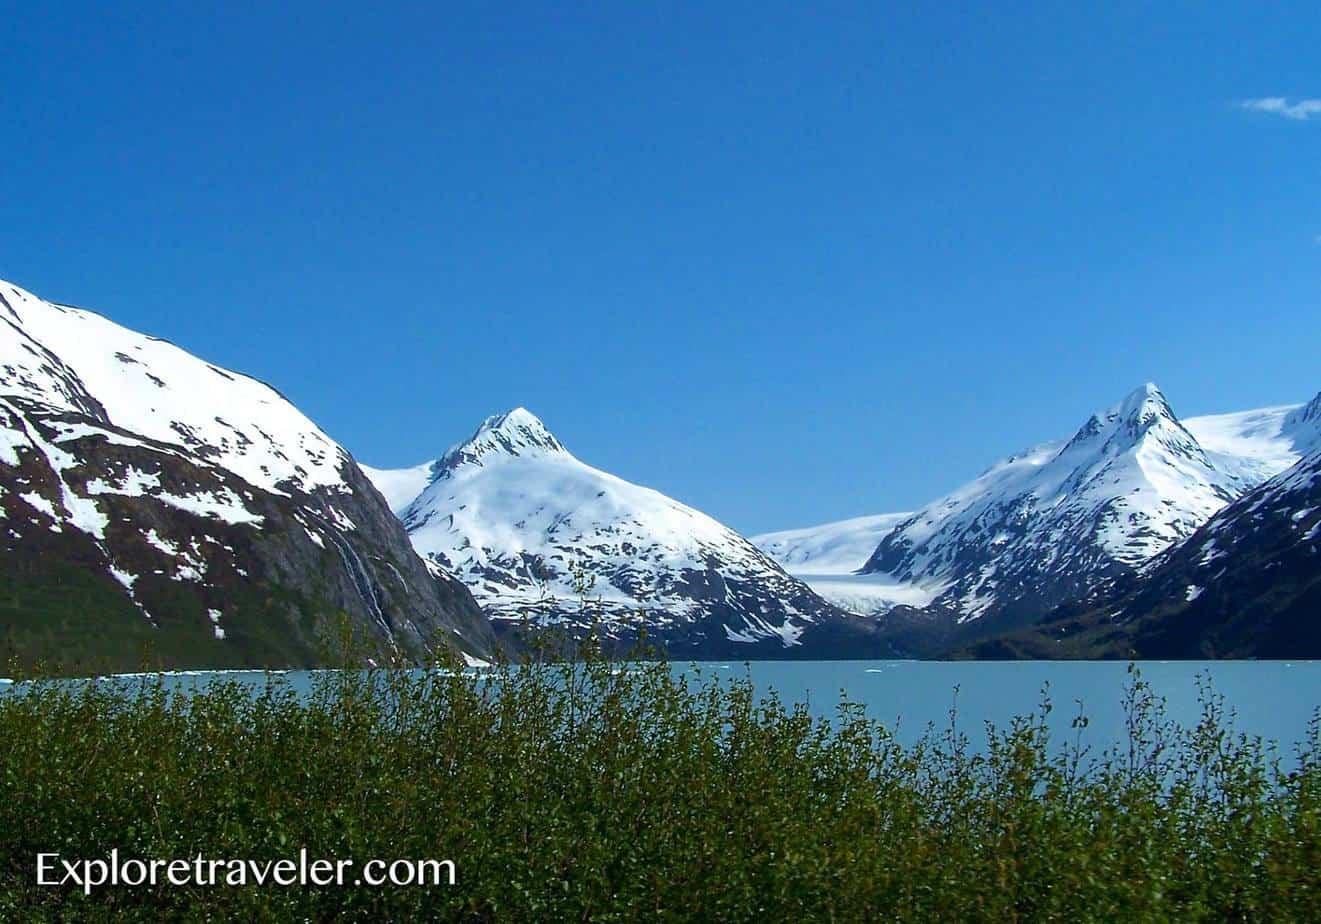 Whittier Alaska Gateway to the glacier and wildlife filled Prince William Sound